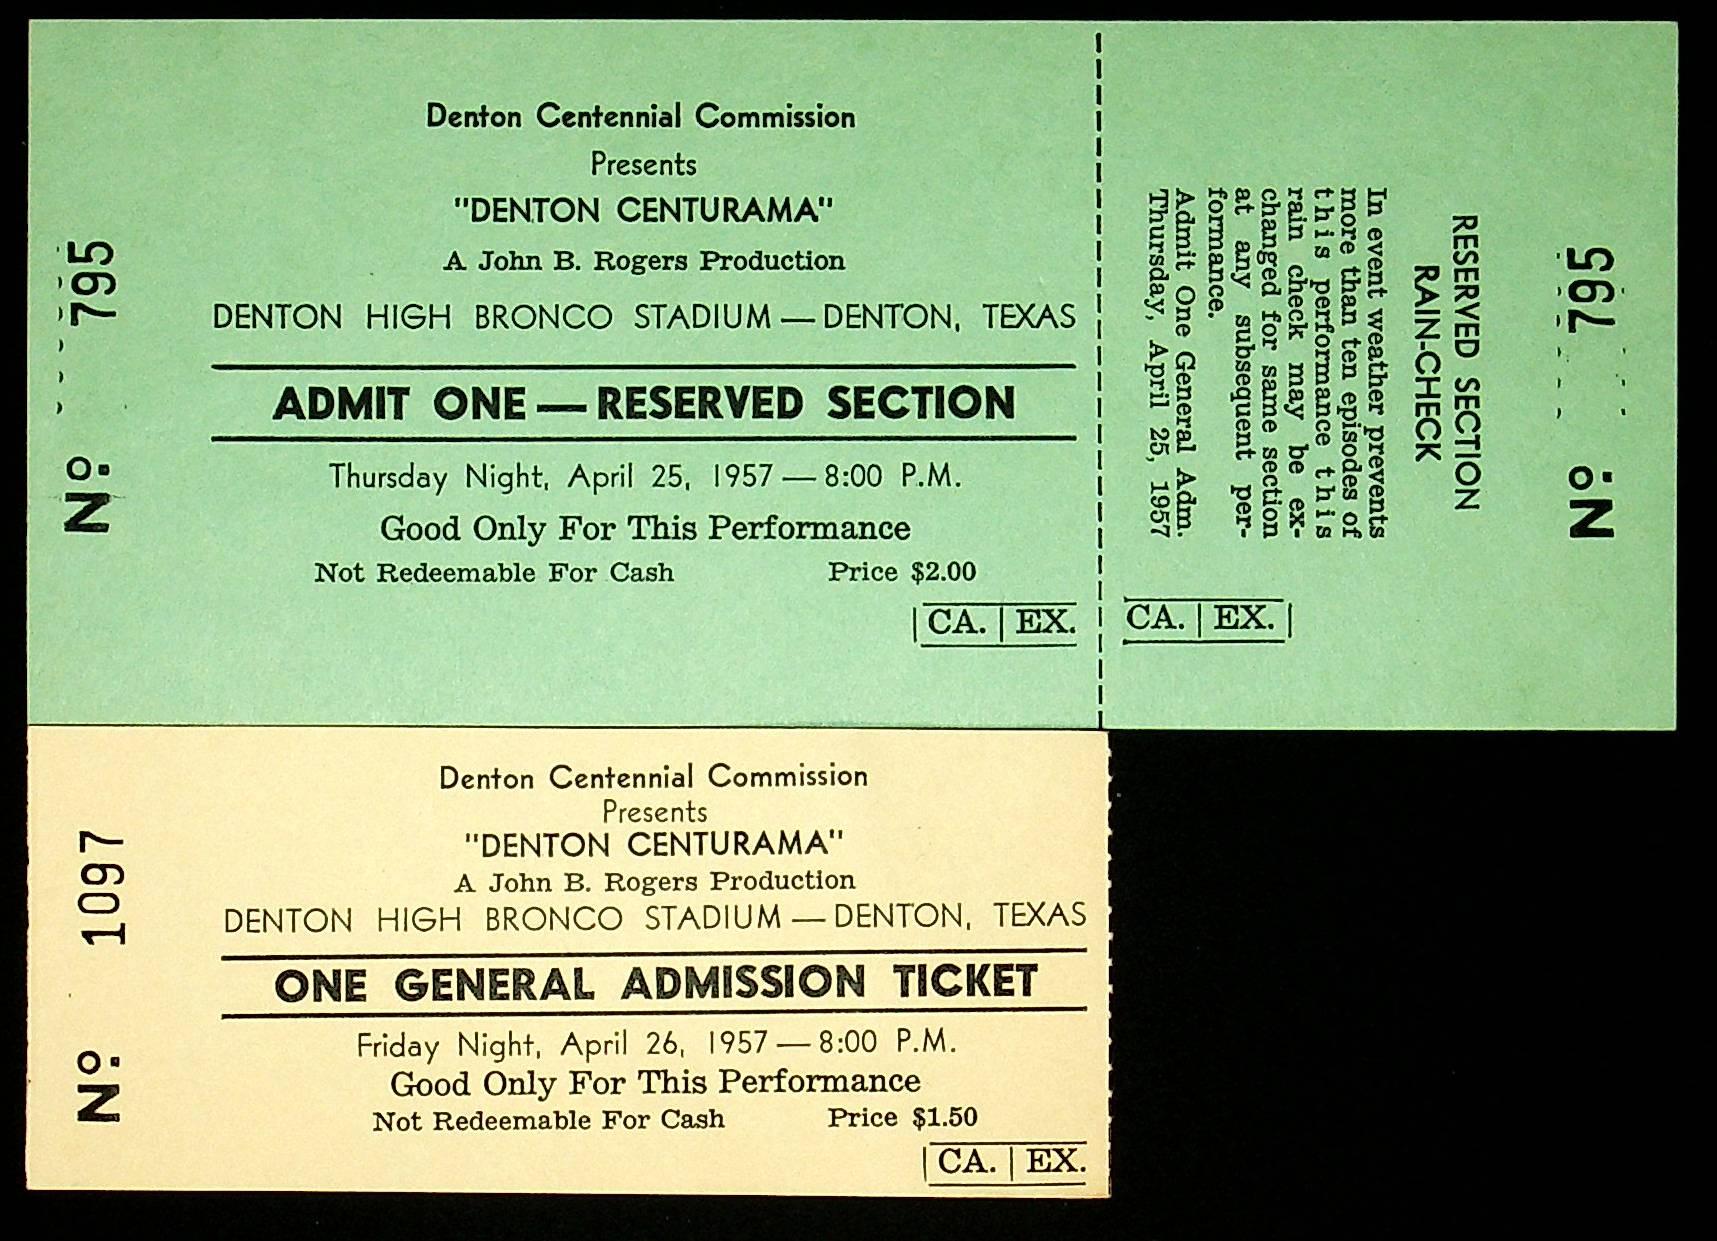 Denton Centurama Tickets